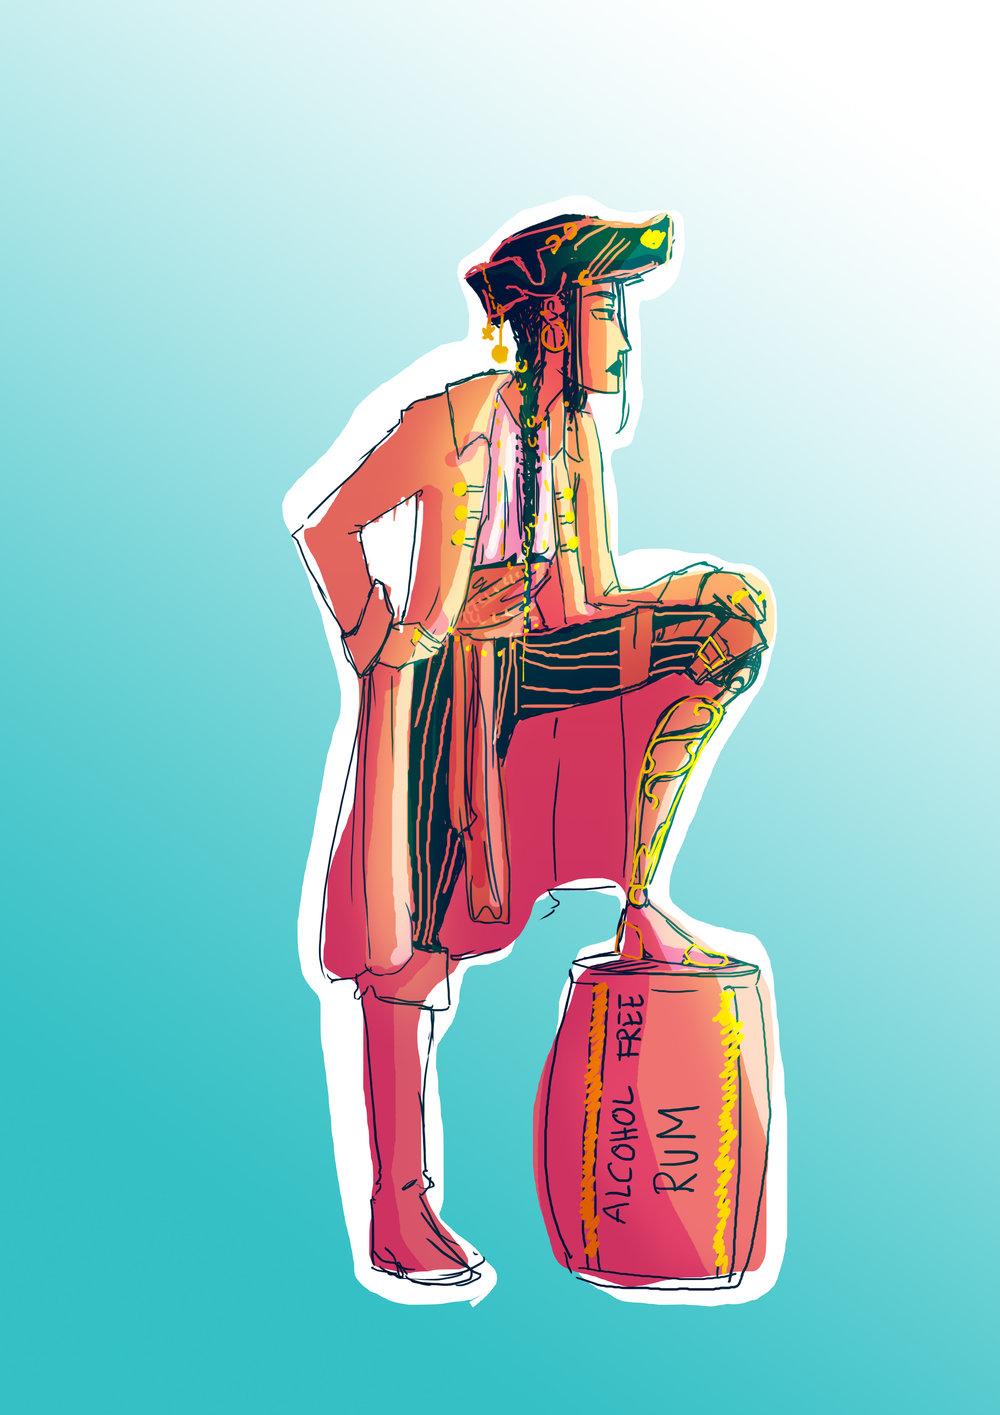 Outfit 3 (Peg Leg Test)